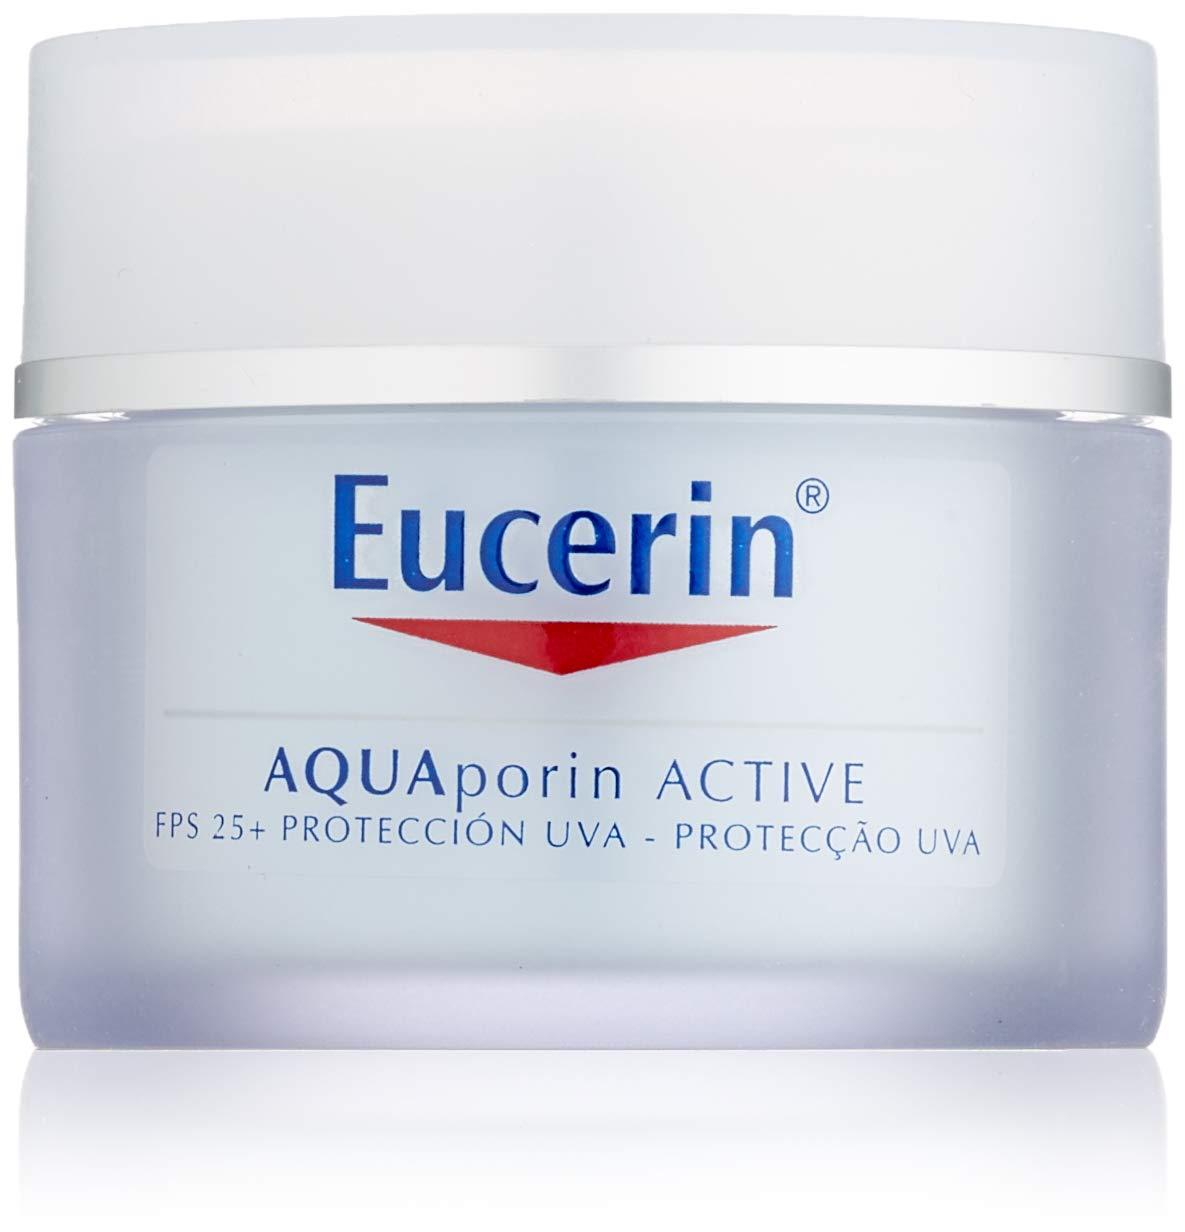 Eucerin – Crema aquaporin active spf25+